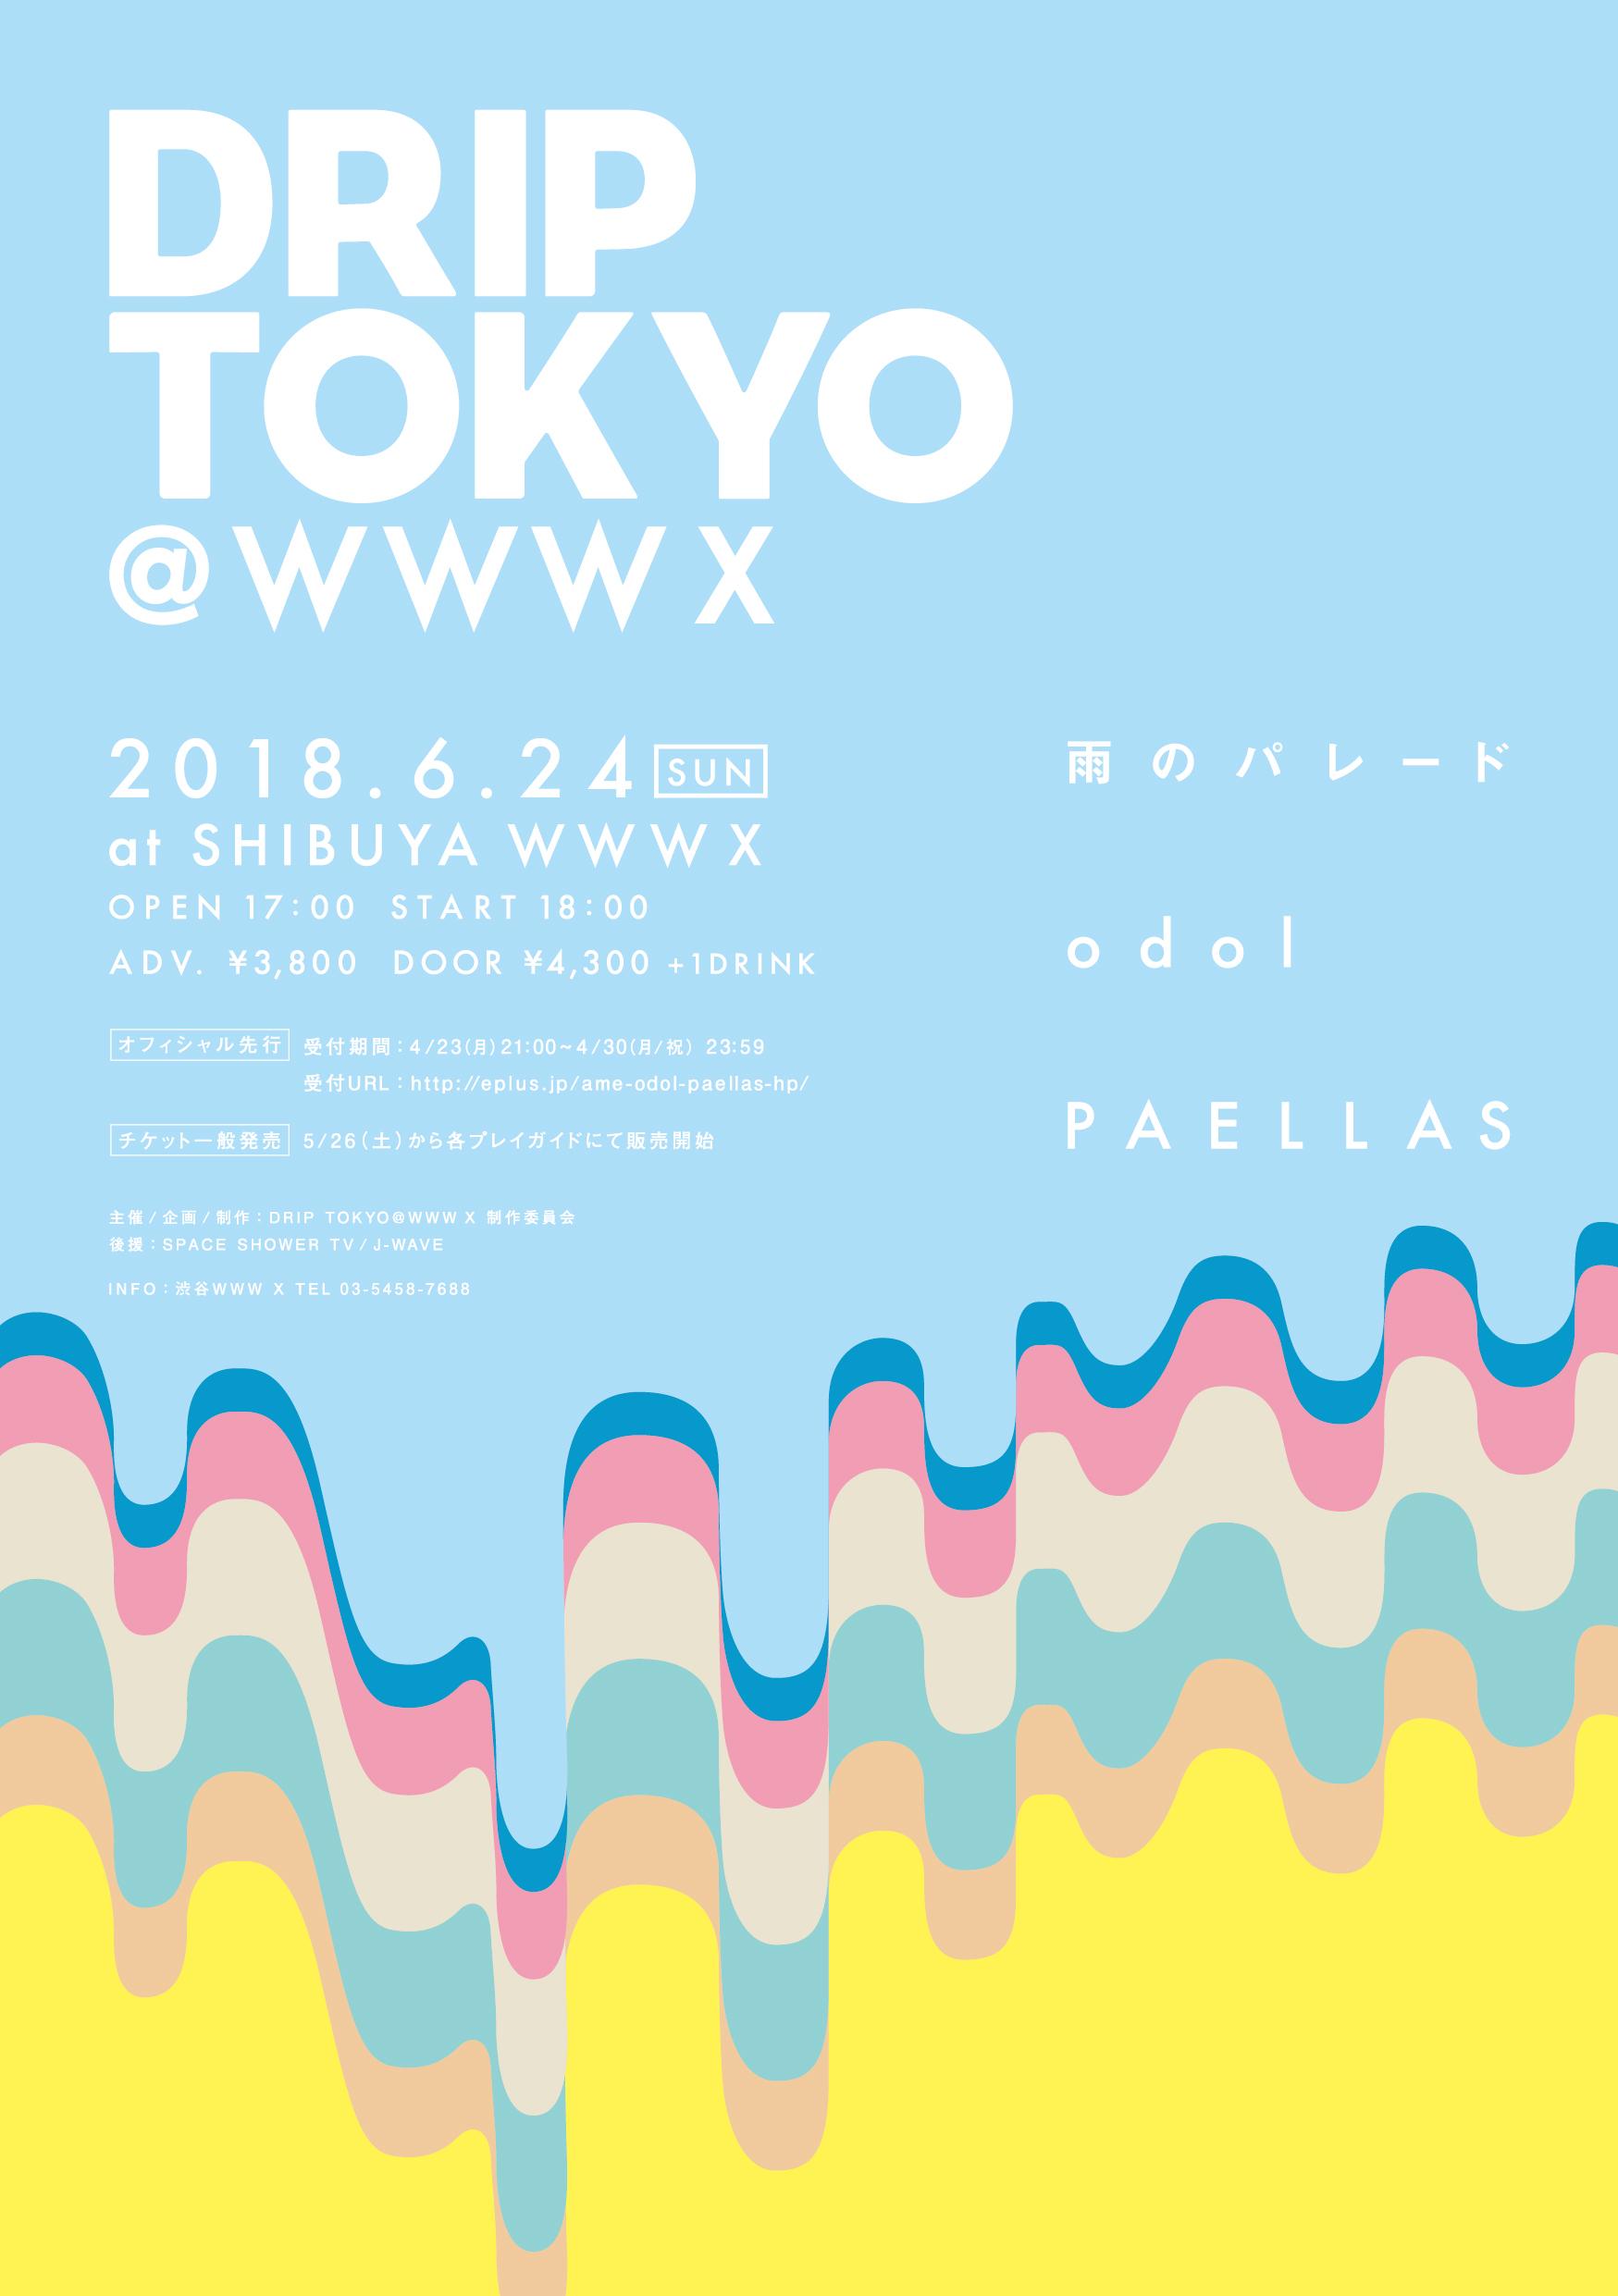 『DRIP TOKYO』